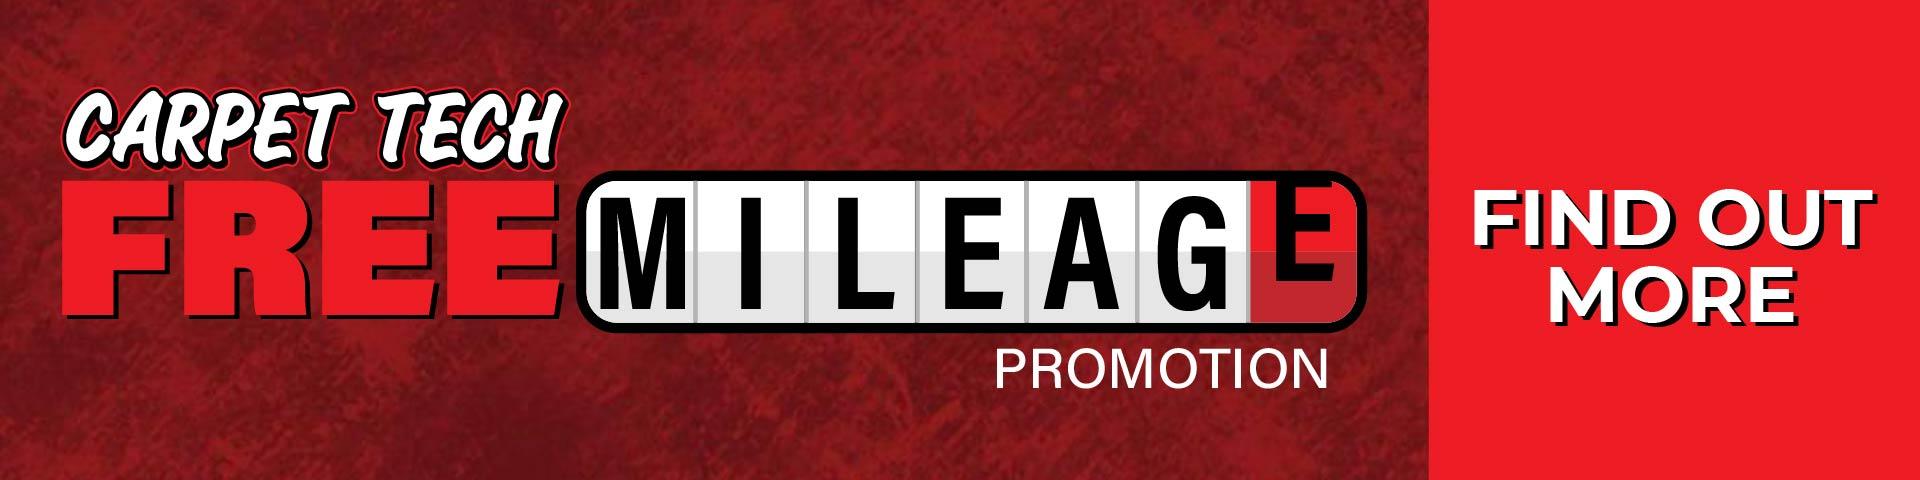 FREE Mileage Promotion